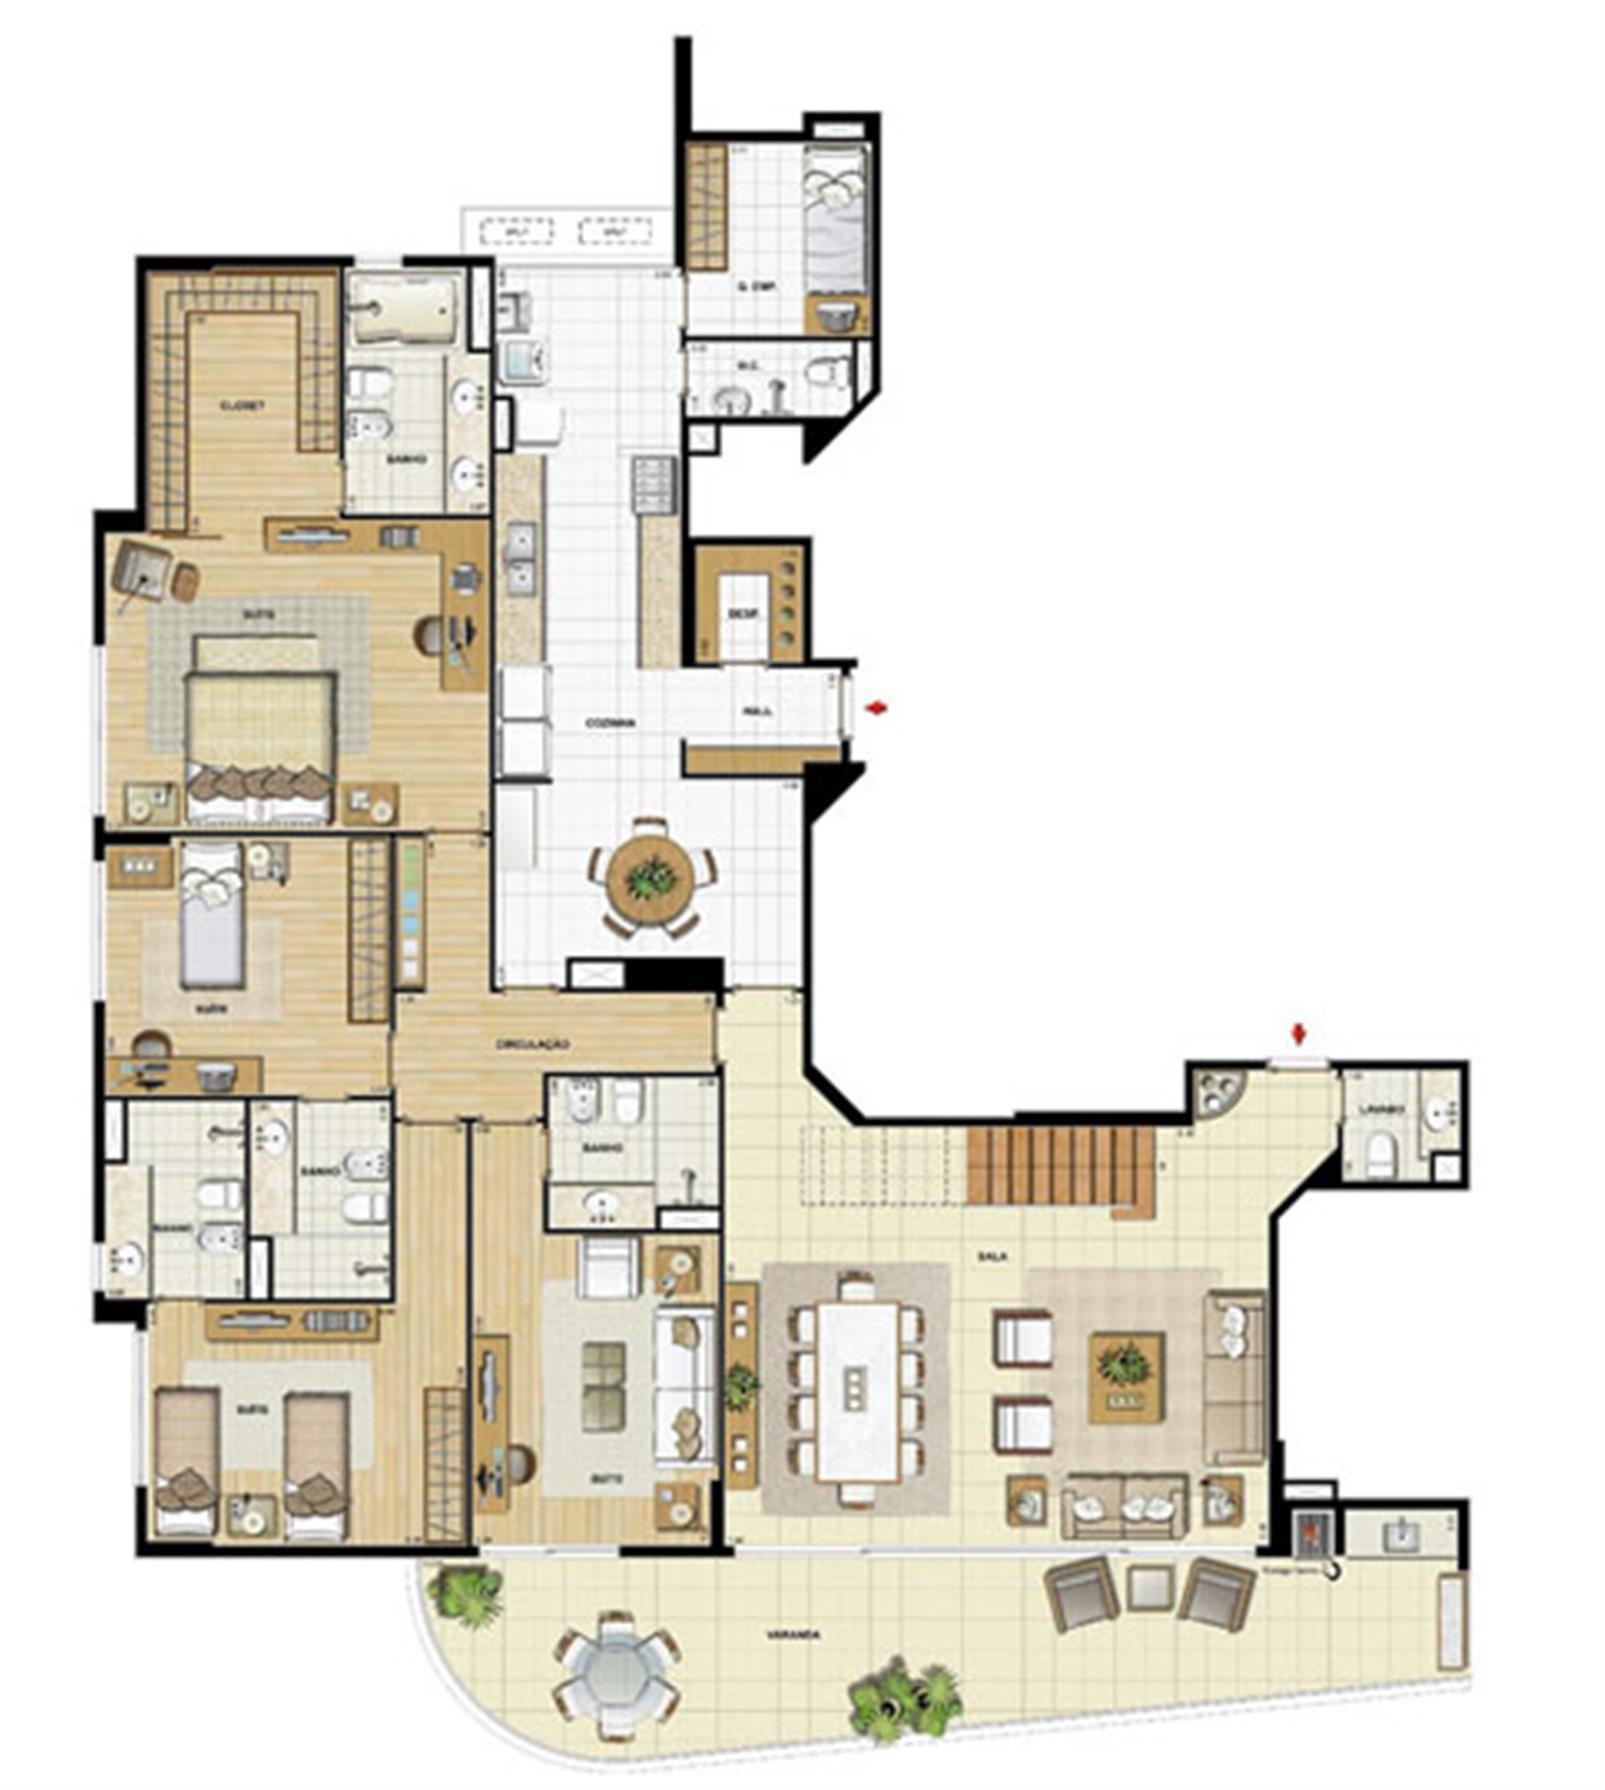 Edifício Le Petit Anse - Planta do 15º pvto. (col. 1) | Saint Barth – Apartamentona  Barra da Tijuca - Rio de Janeiro - Rio de Janeiro